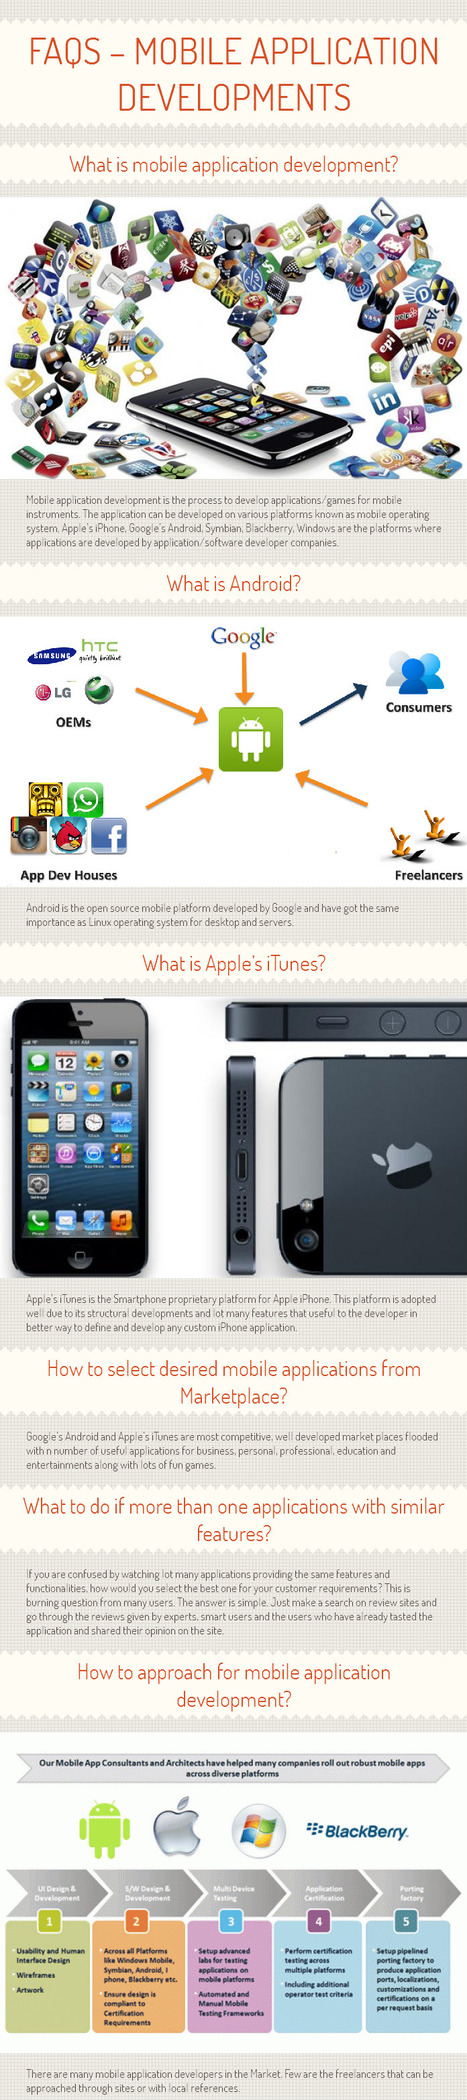 FAQs – Mobile Application Developments [INFOGRAPH] | V-softinc | Scoop.it